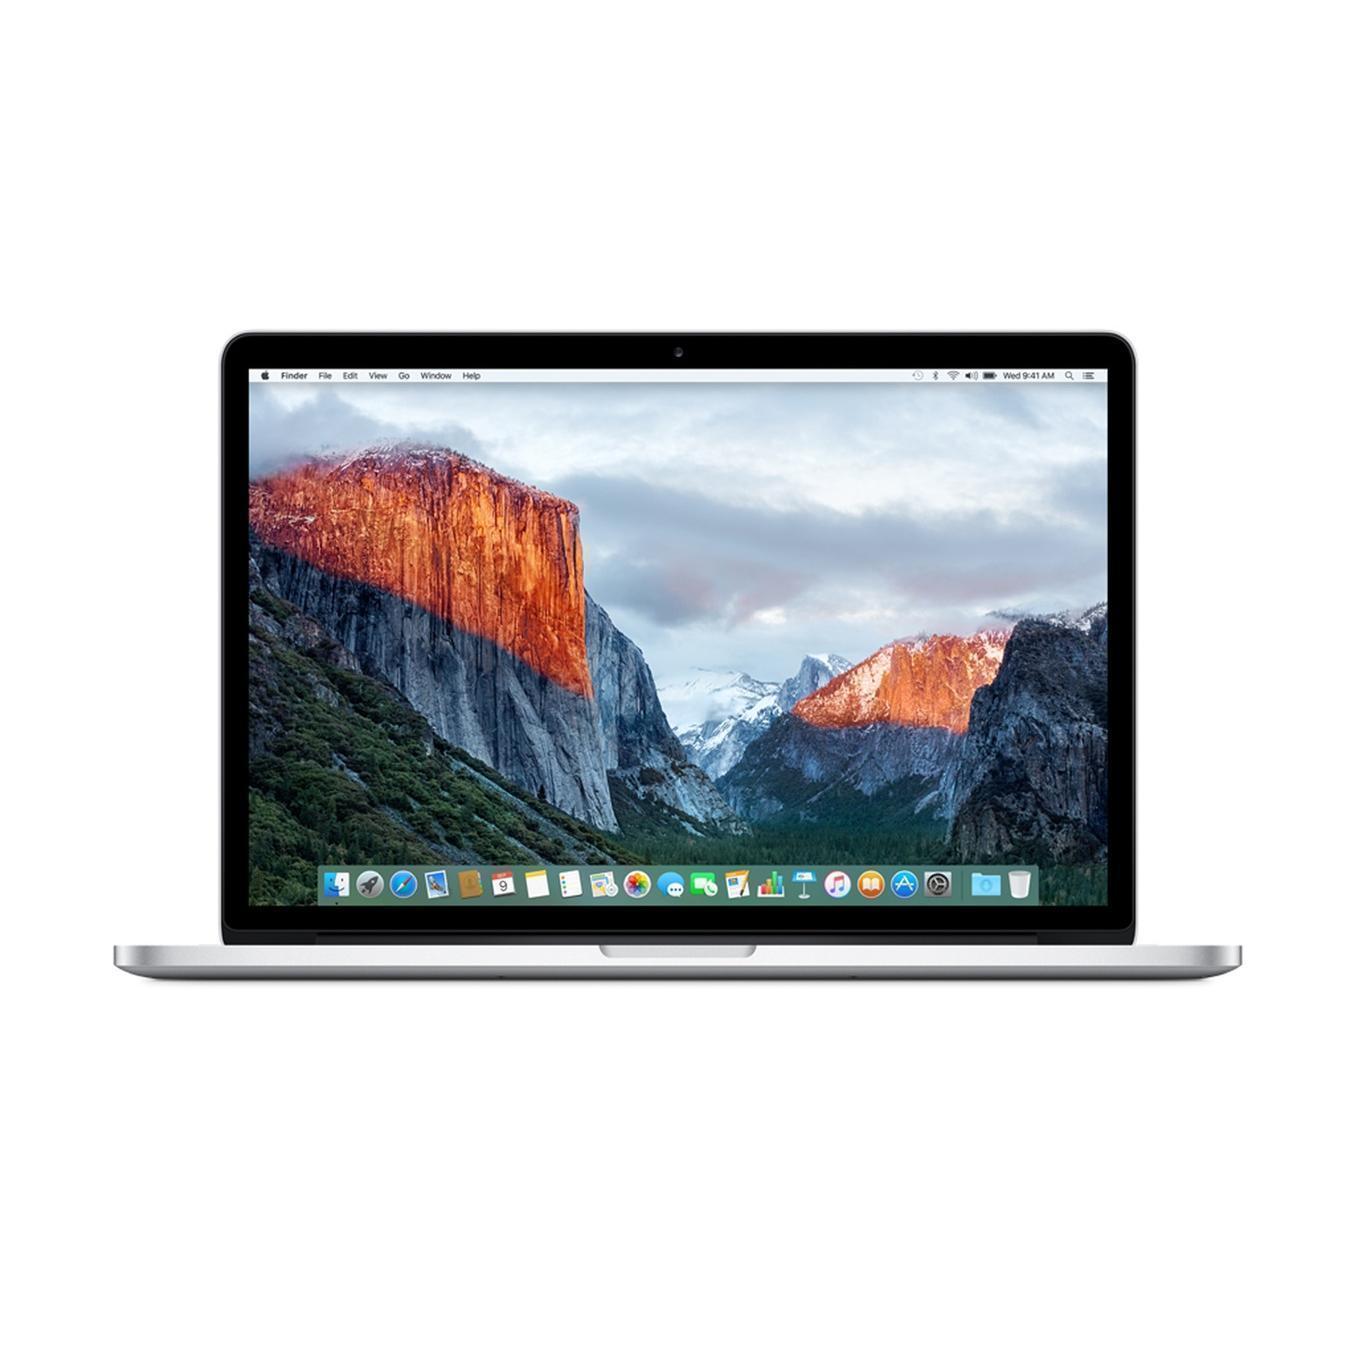 MacBook Pro Retina 15,4-tum (2015) - Core i7 - 16GB - HDD 256 GB AZERTY - Fransk